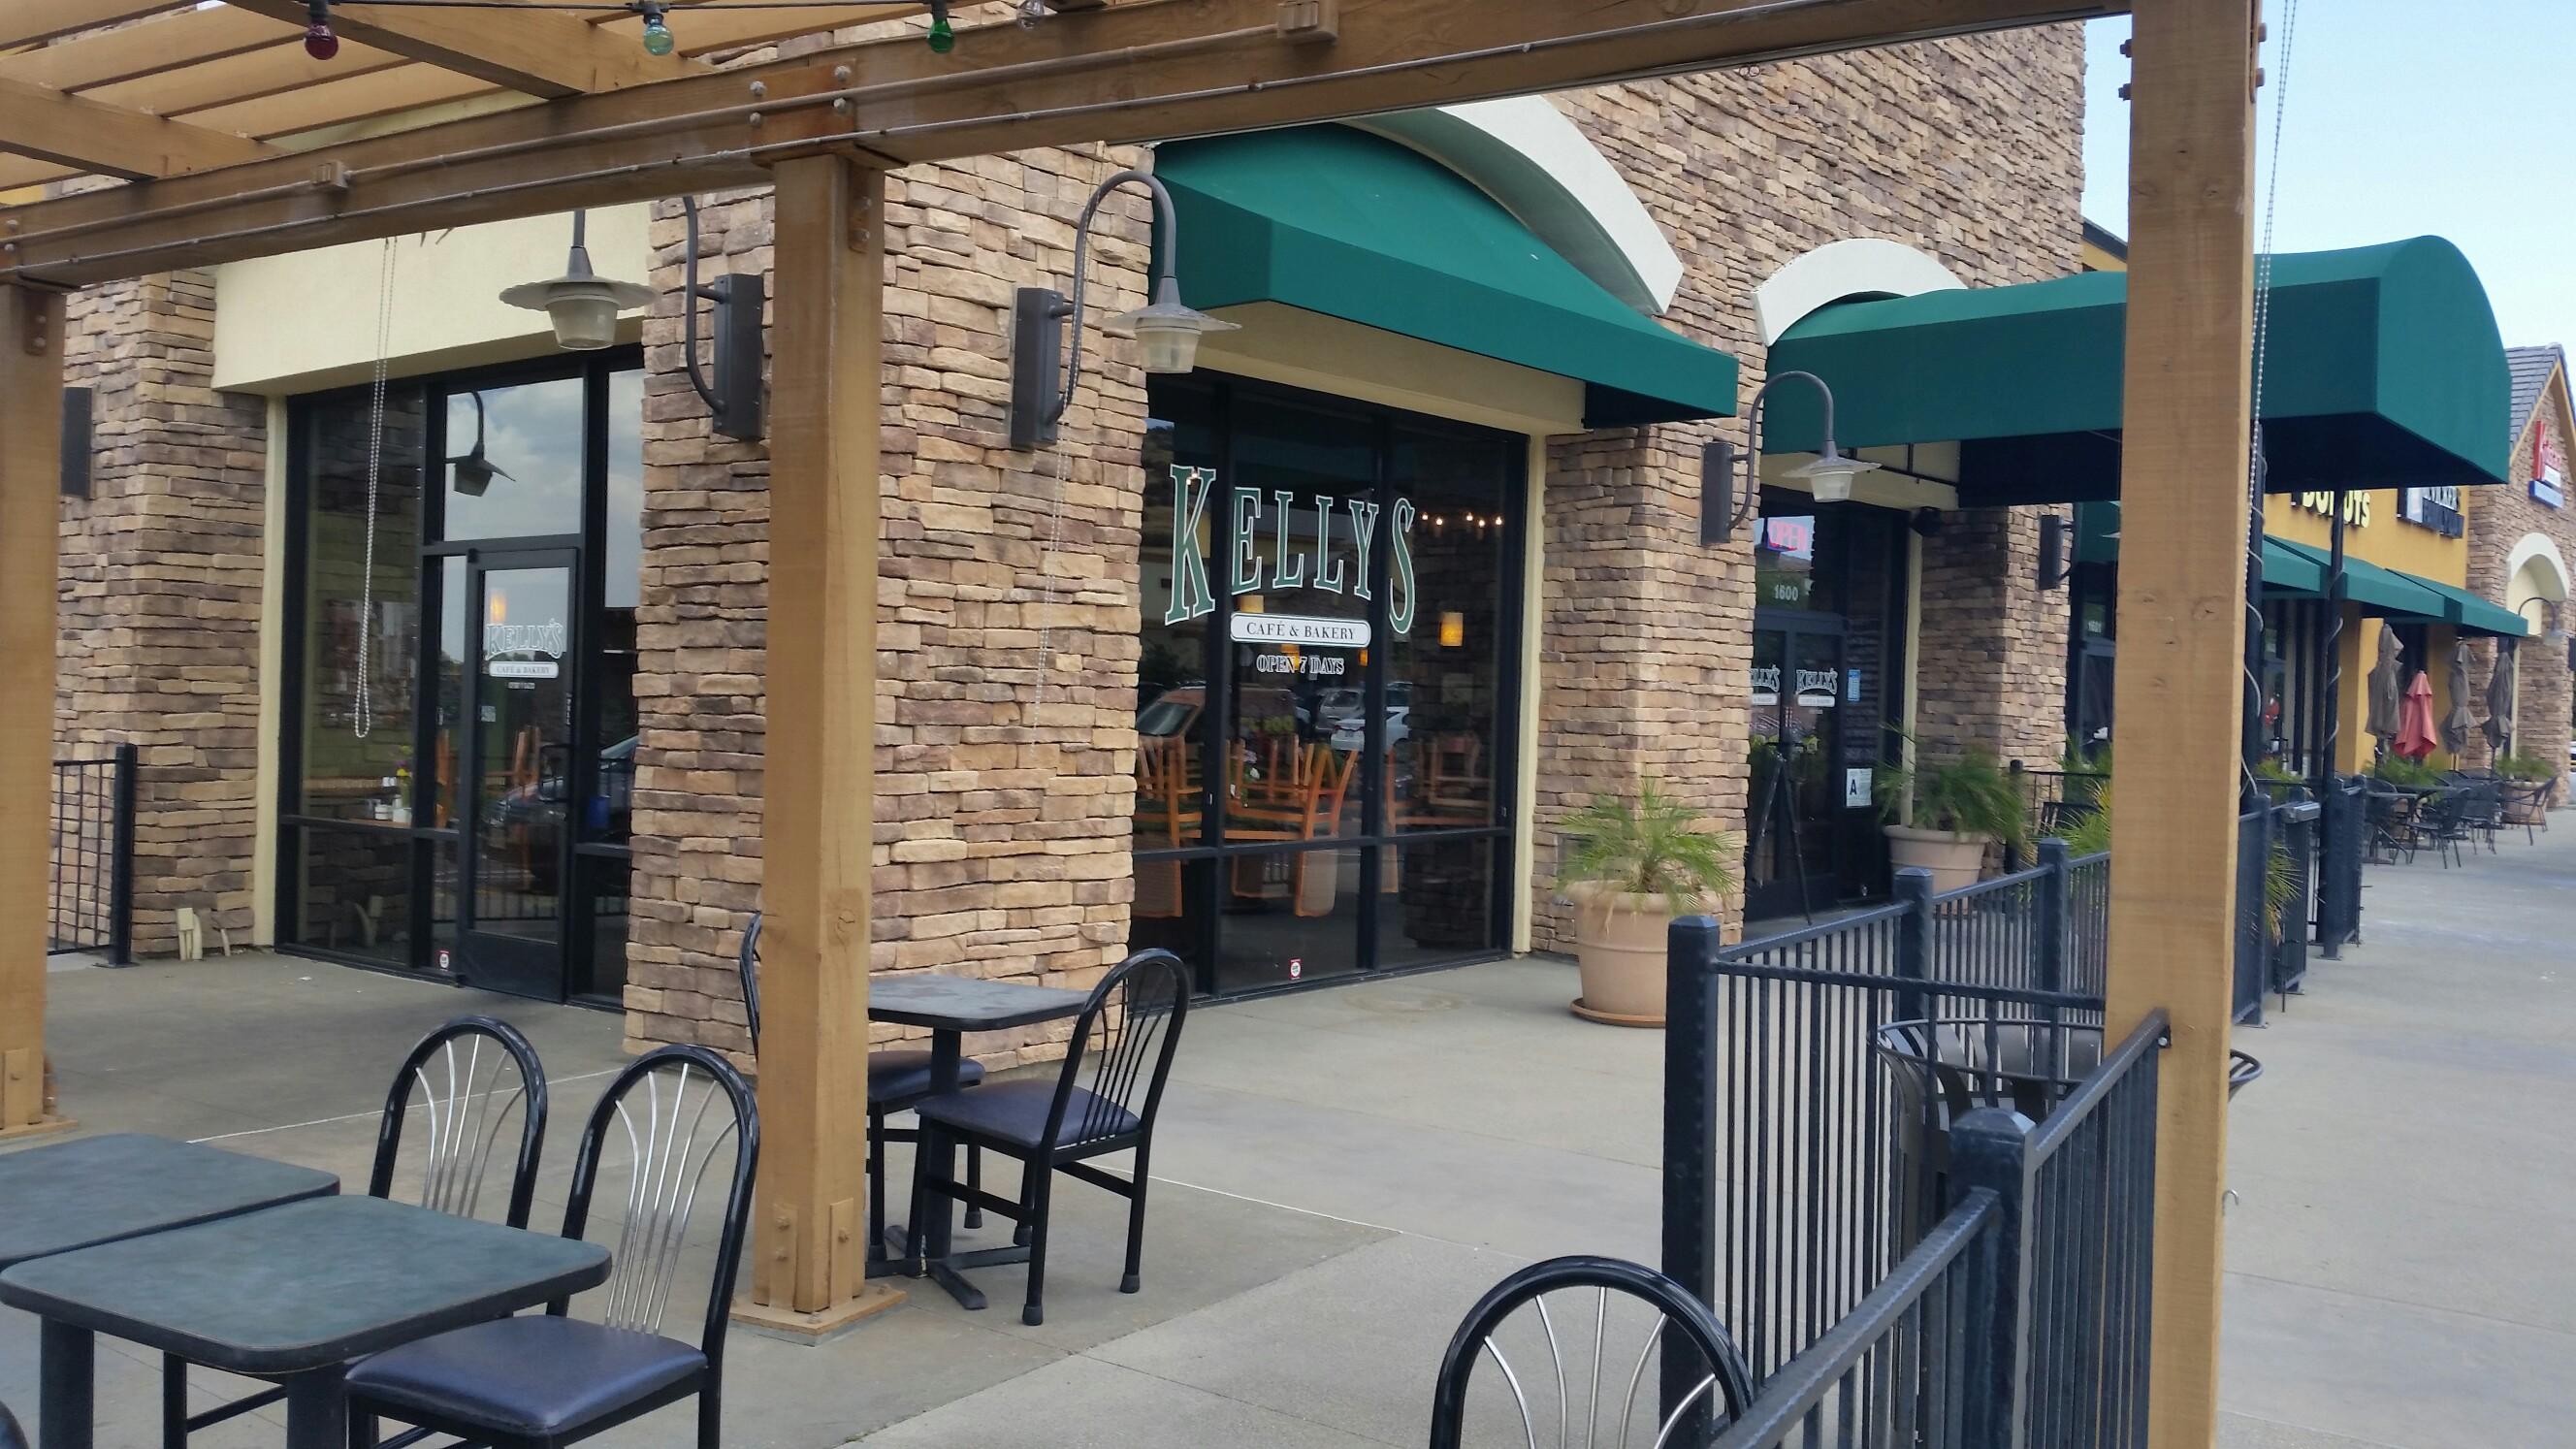 Kelly's Diner, Lake Elsinore CA